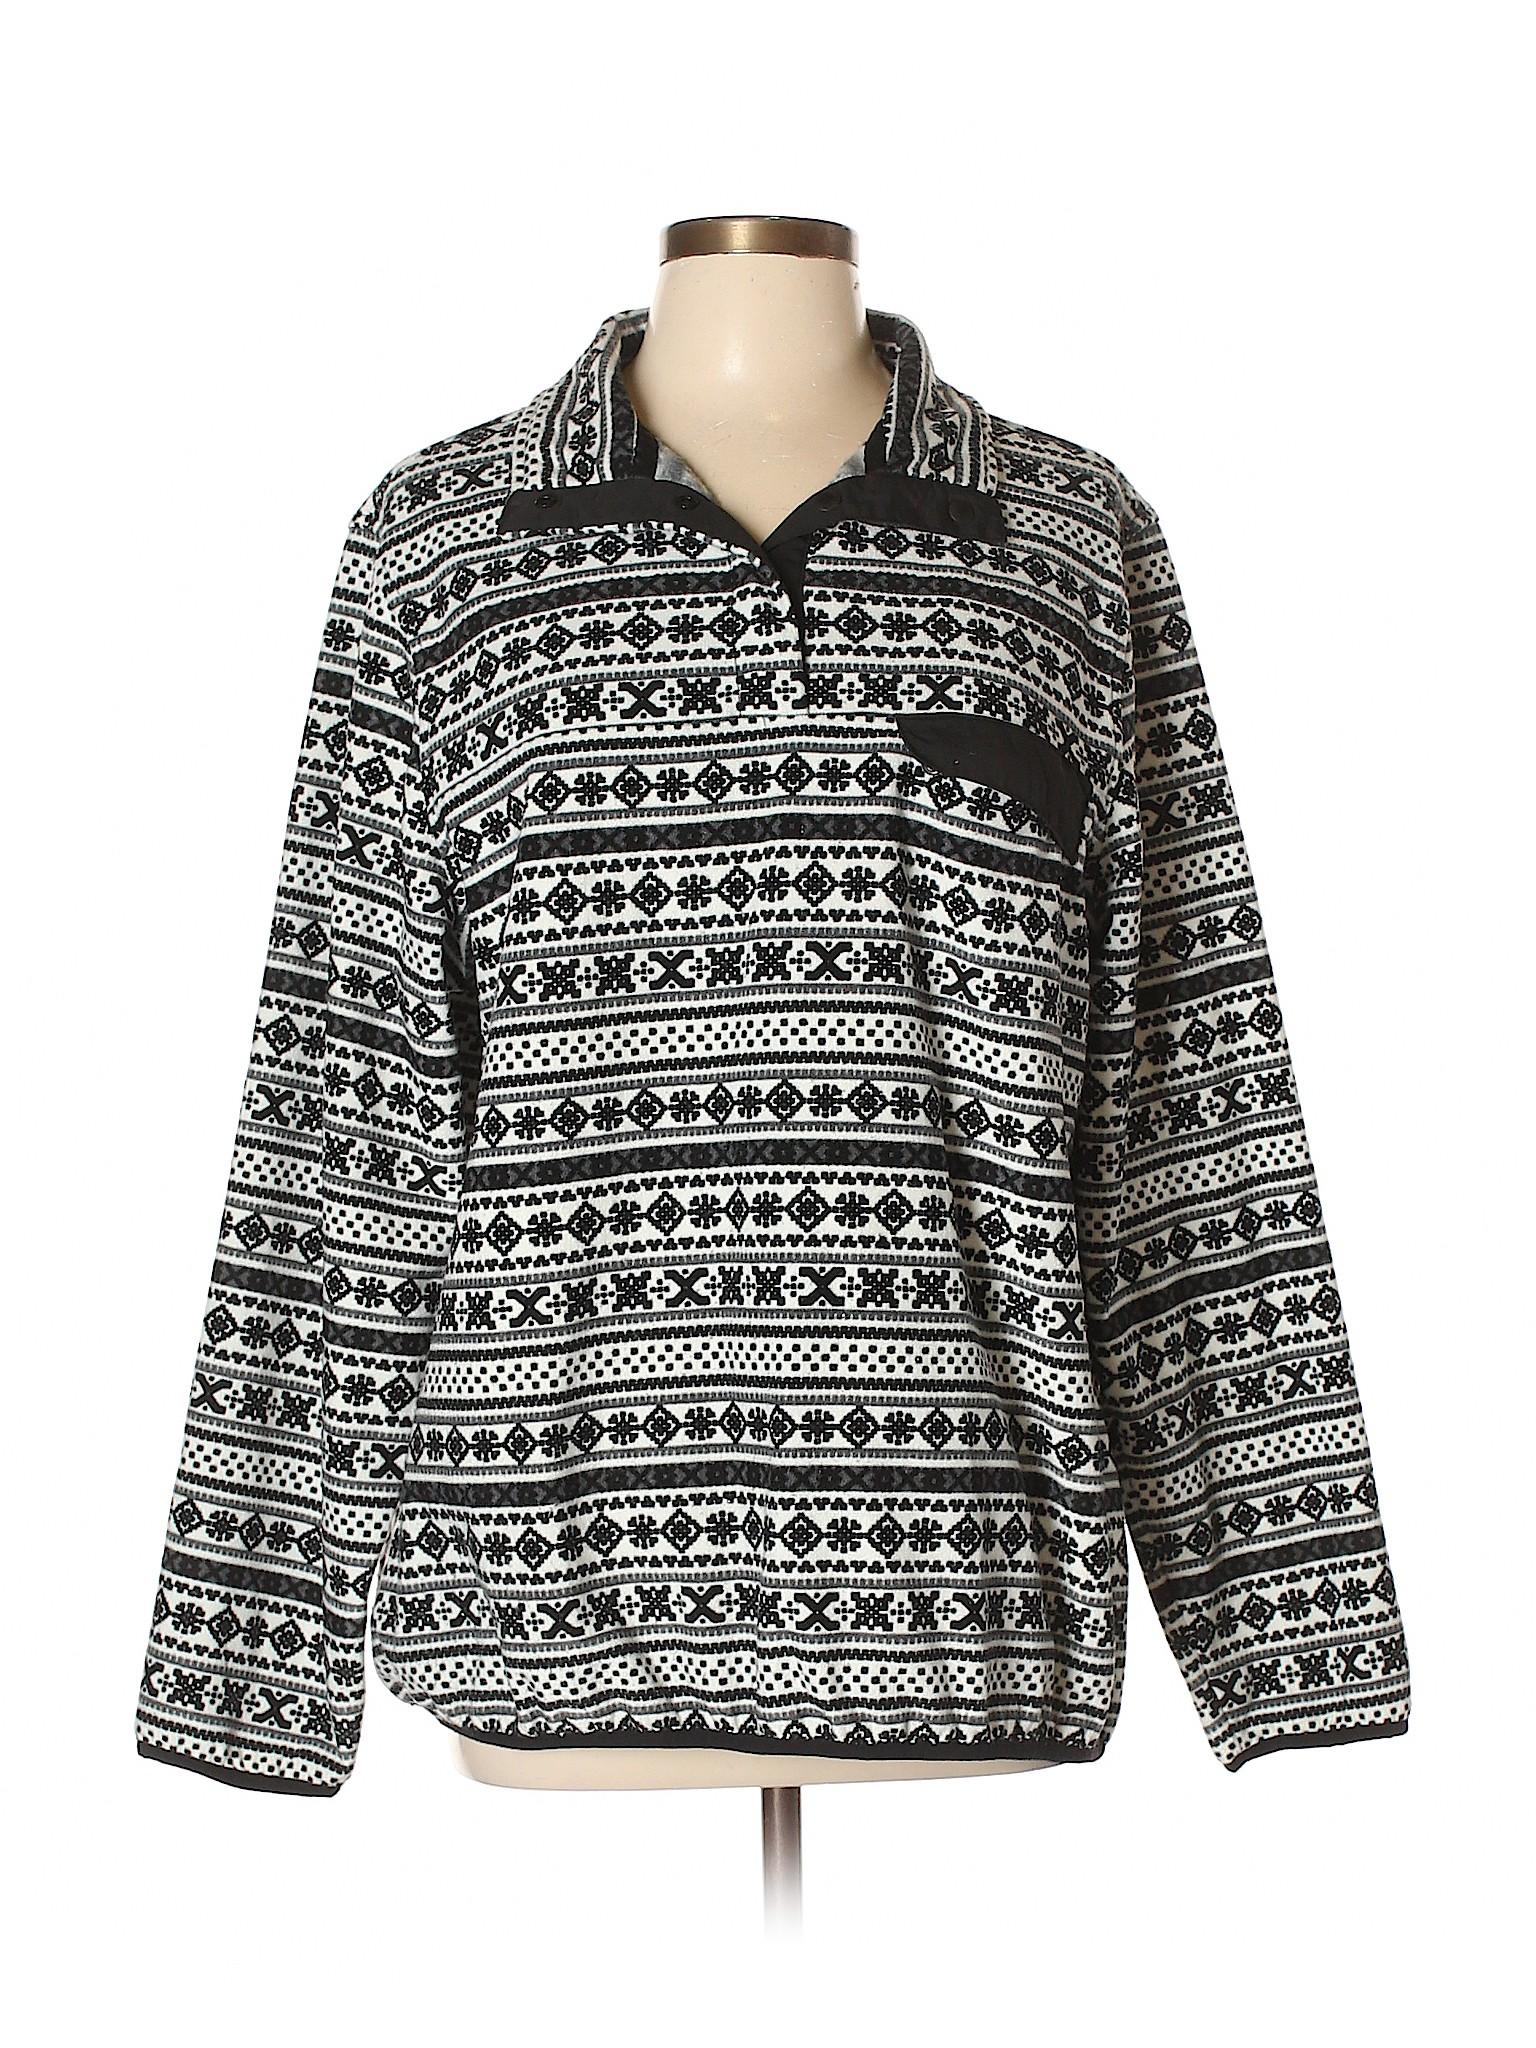 Pullover winter Boutique Boutique winter JACHS Sweater 6xn0IxWvZ